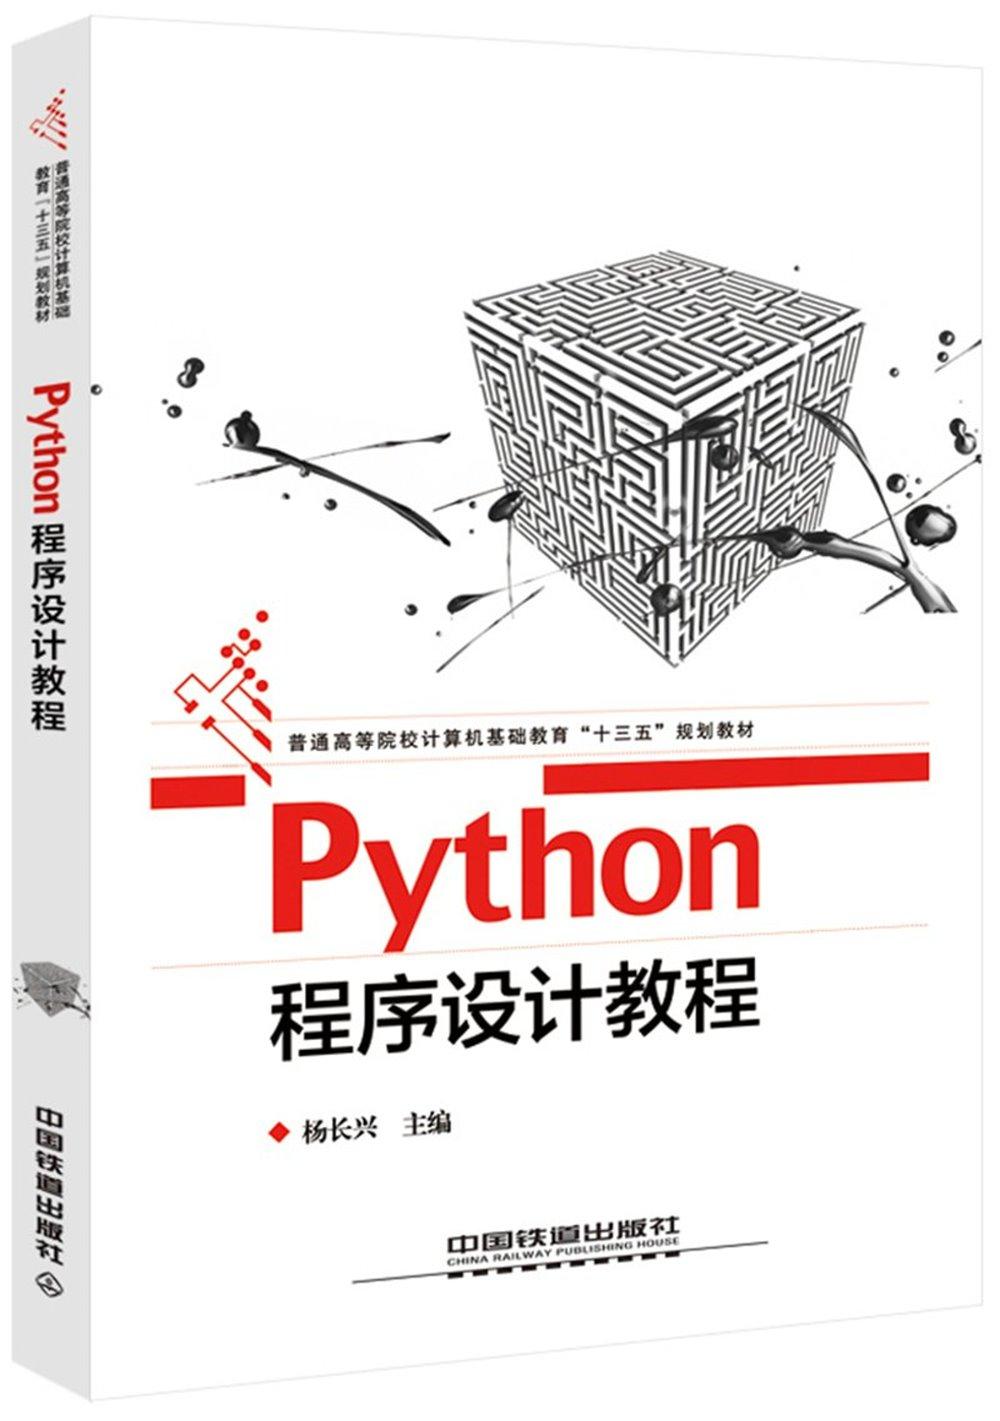 Python程序 教程